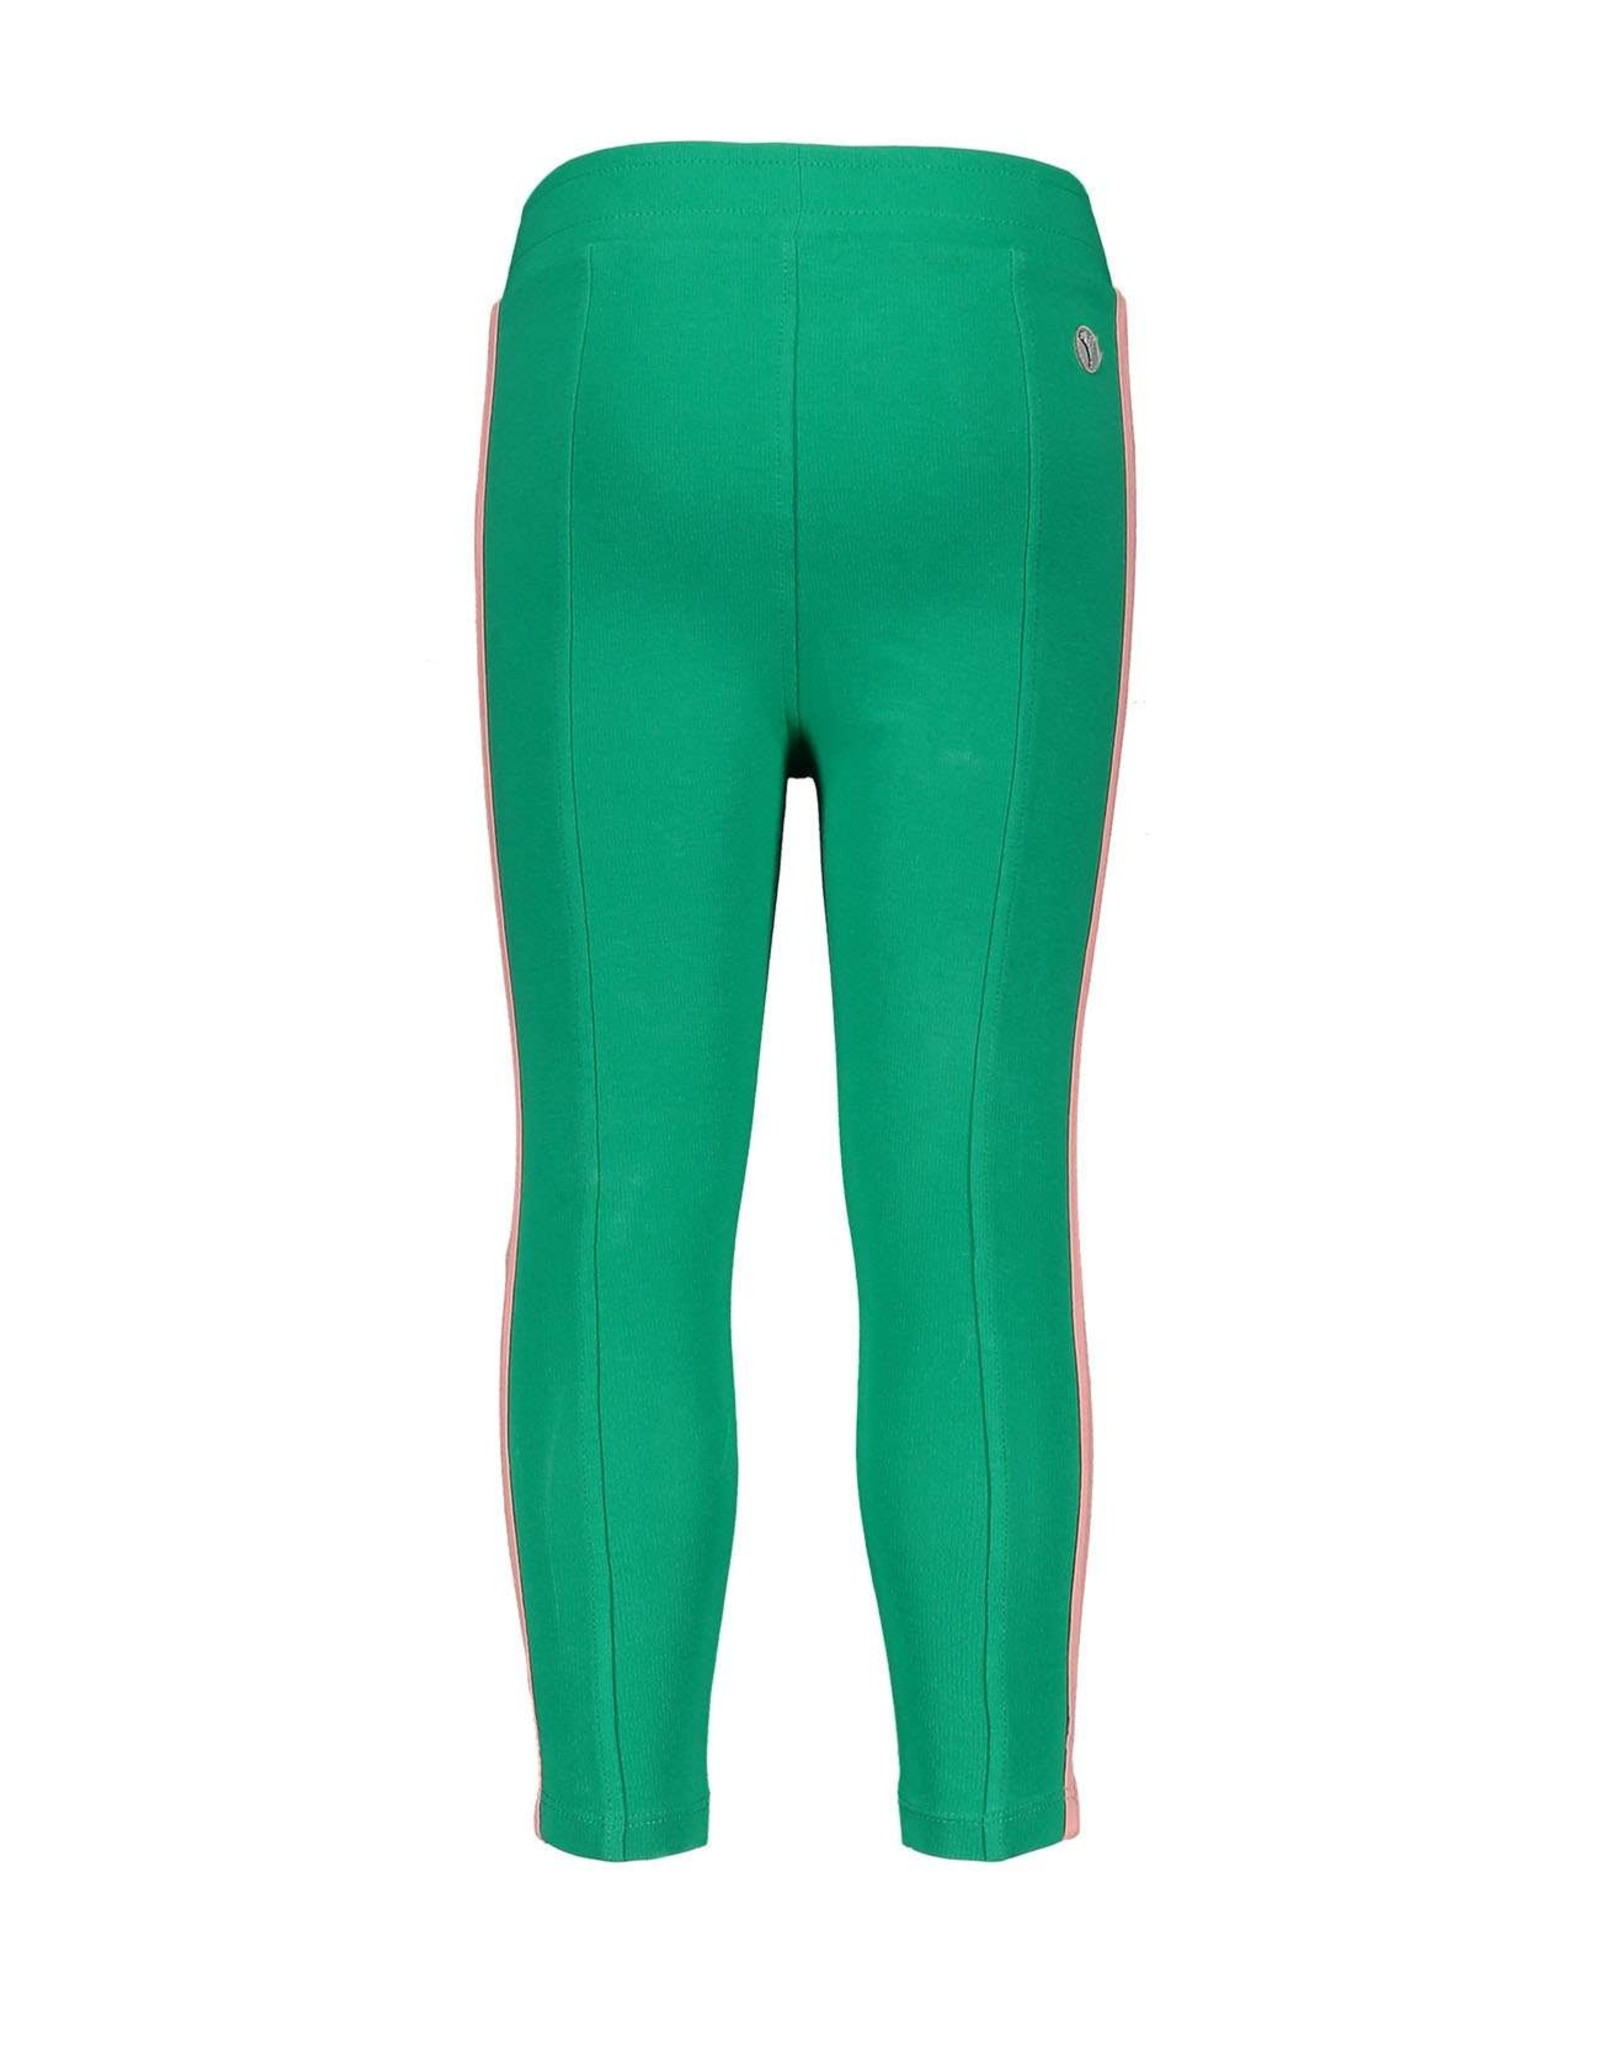 "Moodstreet Moodstreet-MT Pants Pintuck Leg-""Green"""